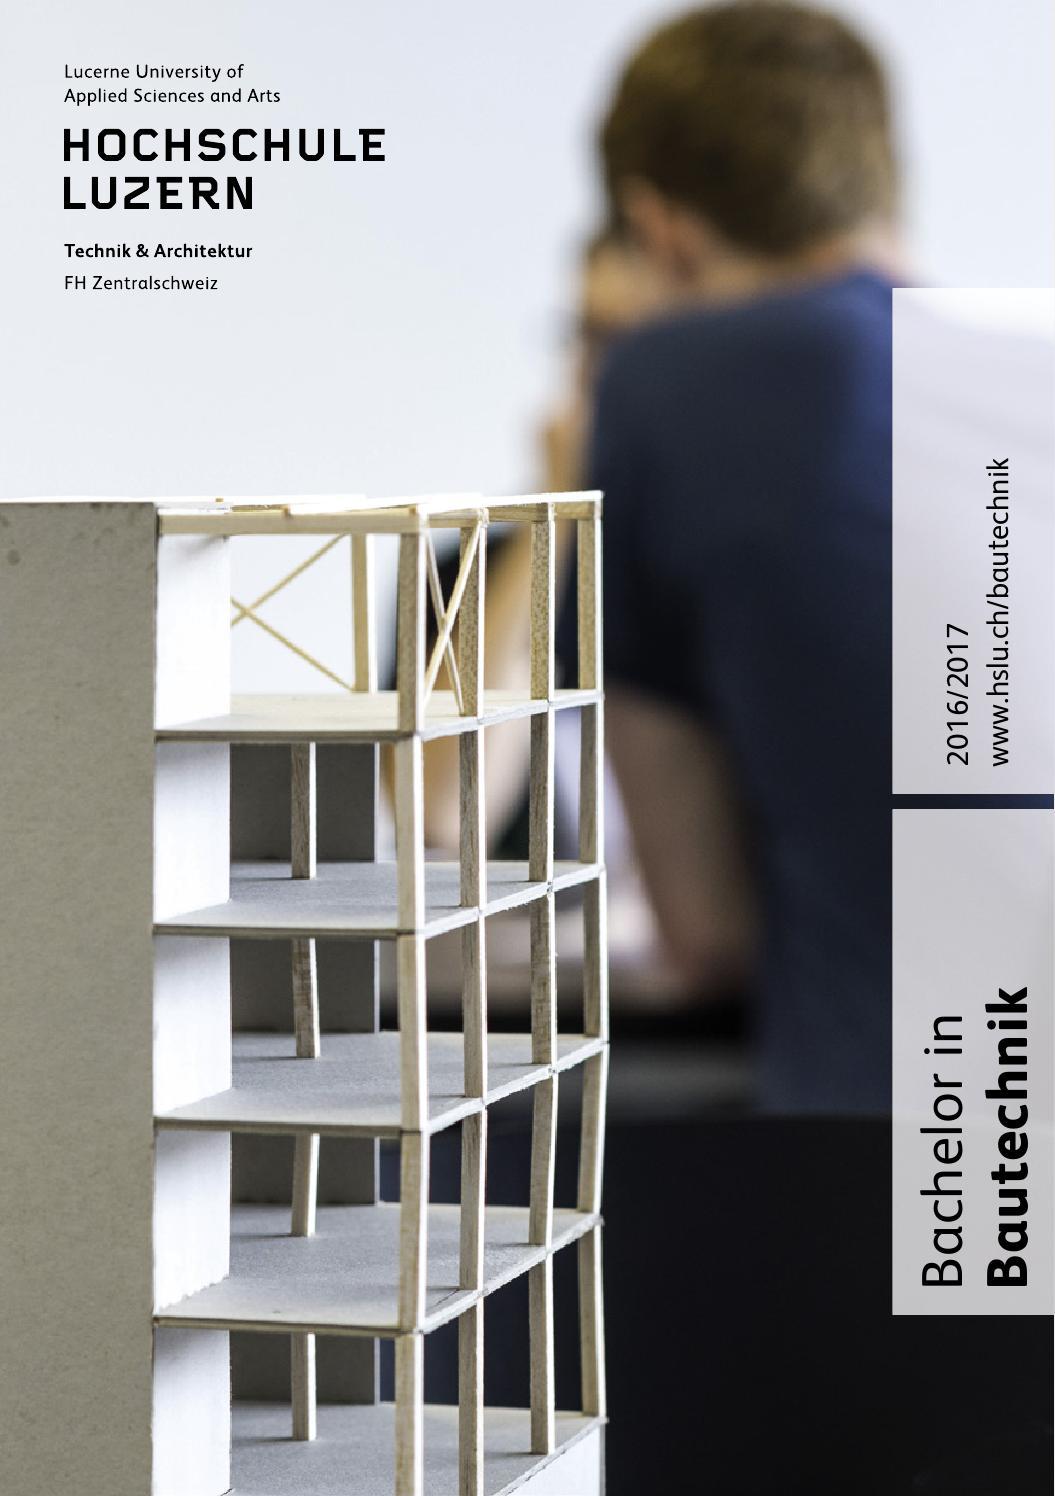 Studienf hrer bachelor bautechnik 2016 2017 by hochschule - Skelettbau architektur ...